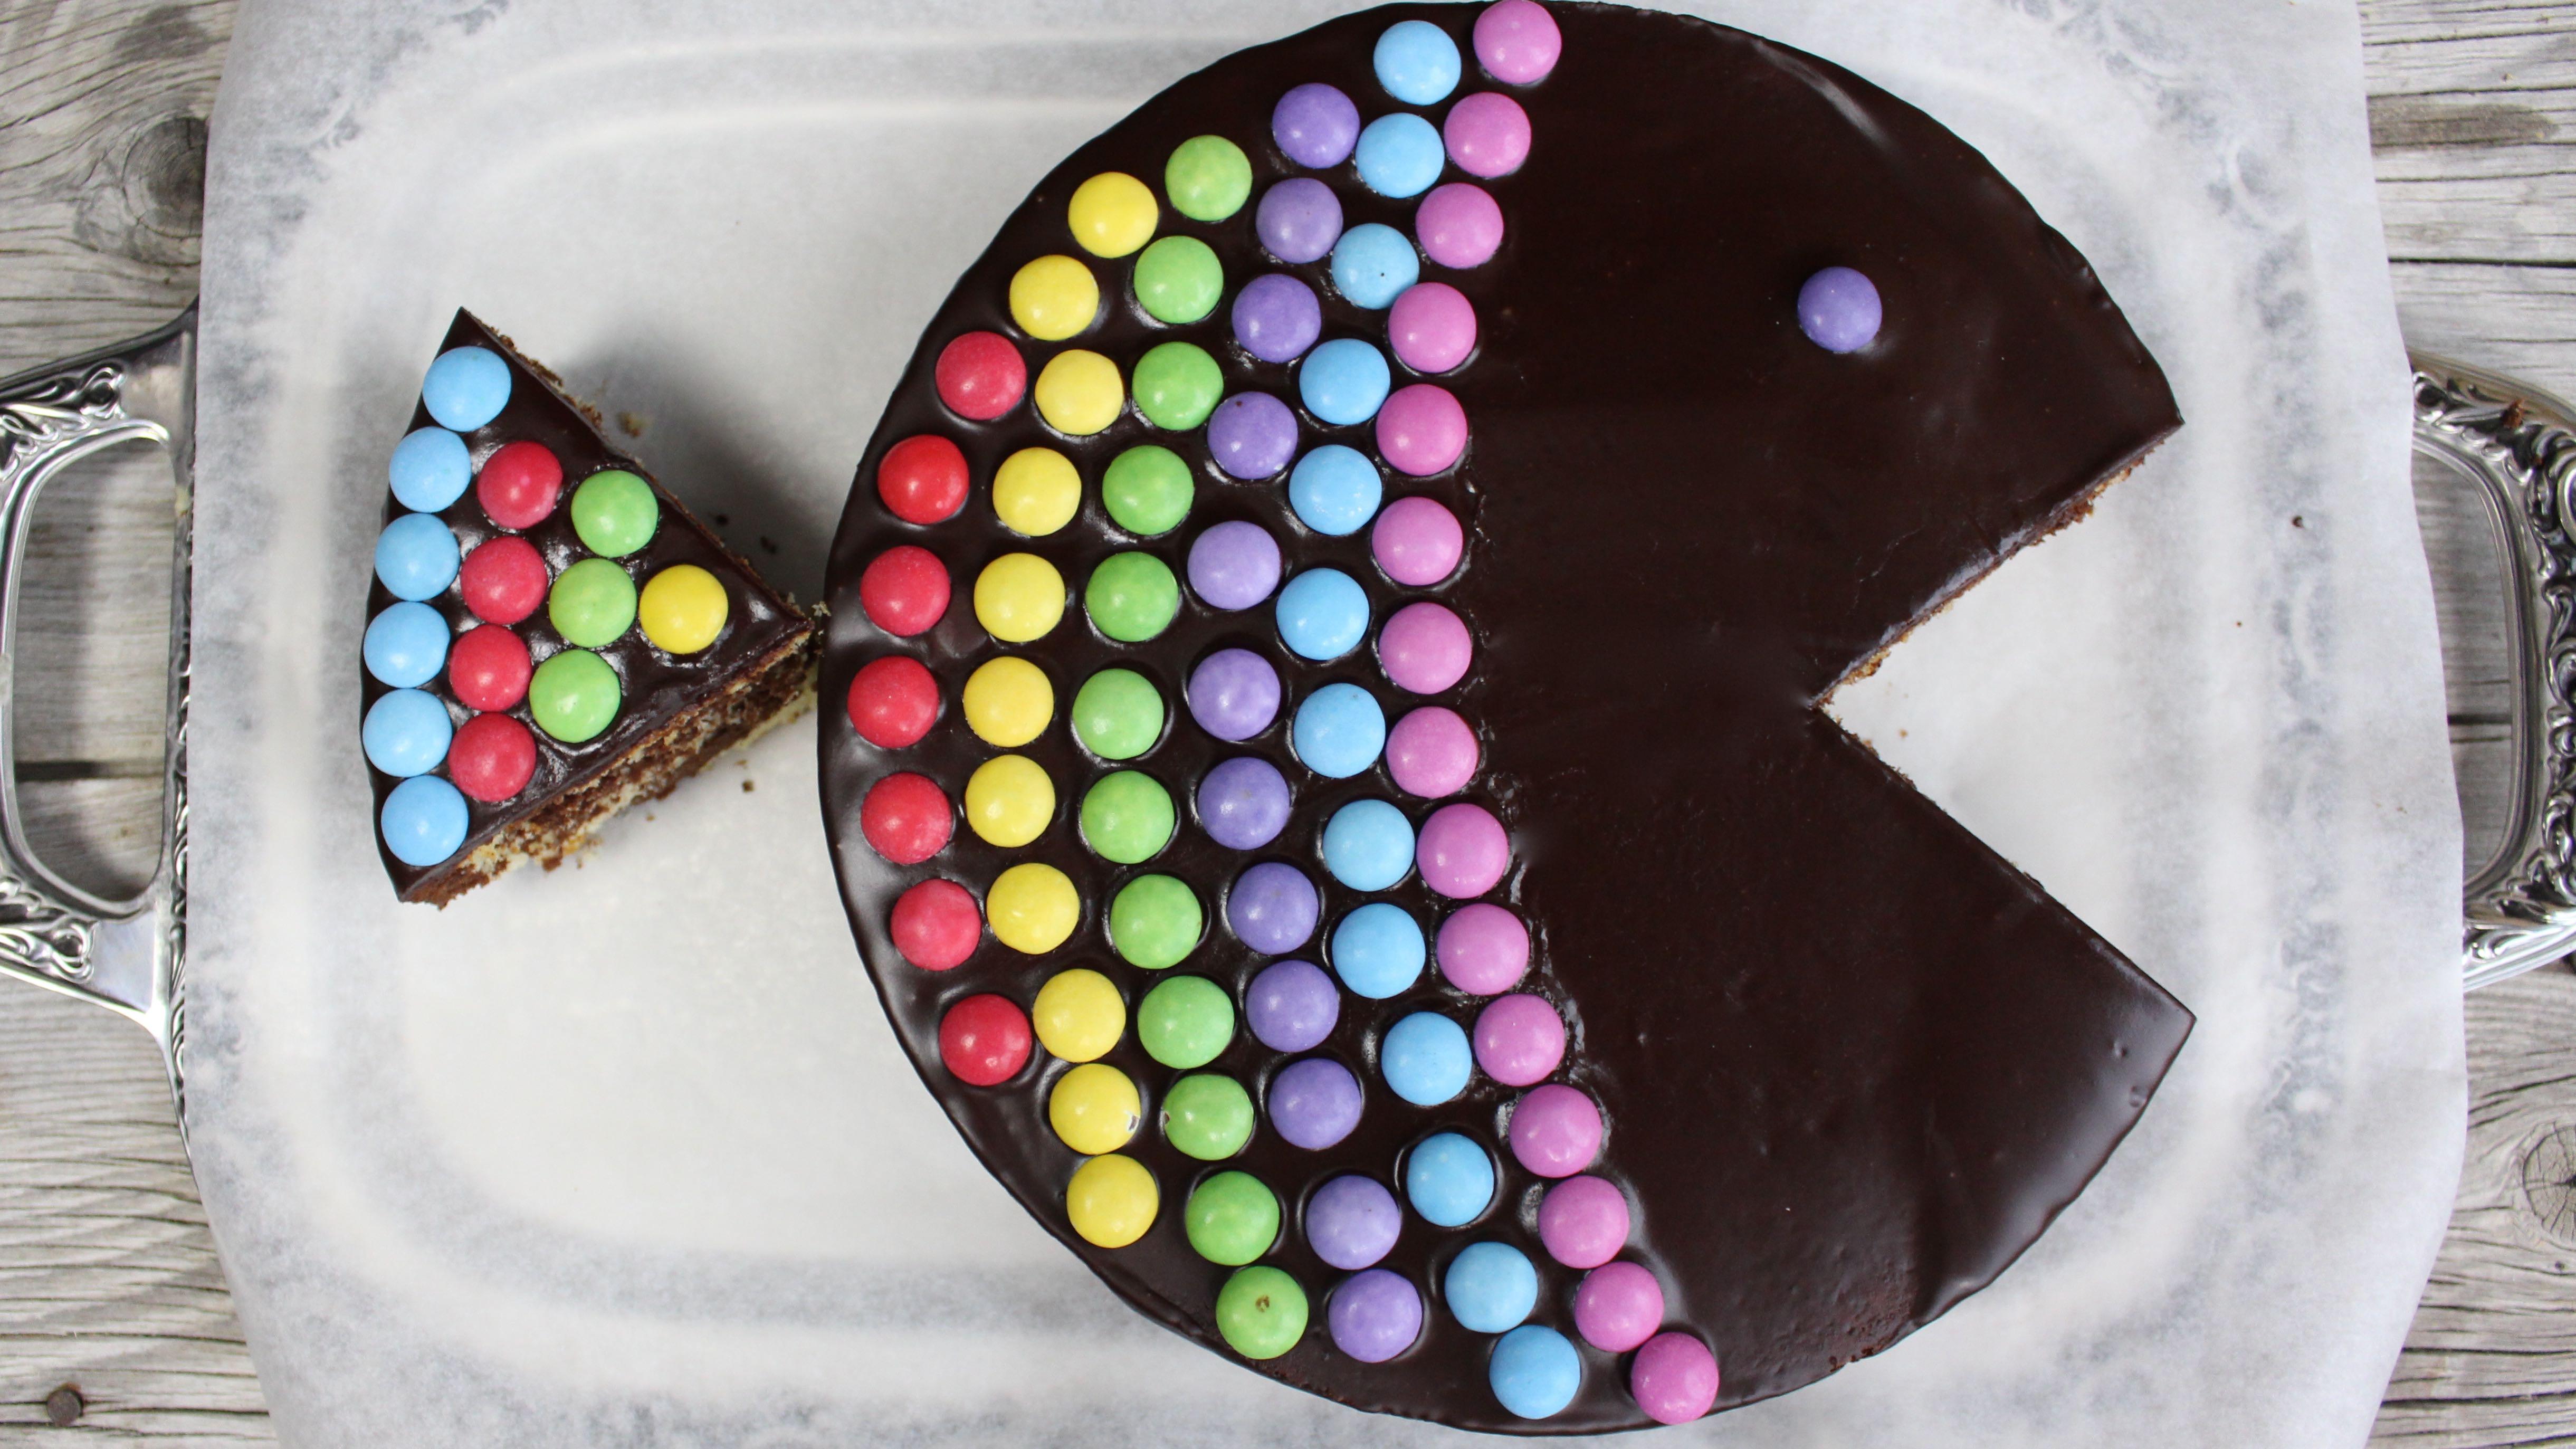 Lovely Cake Images